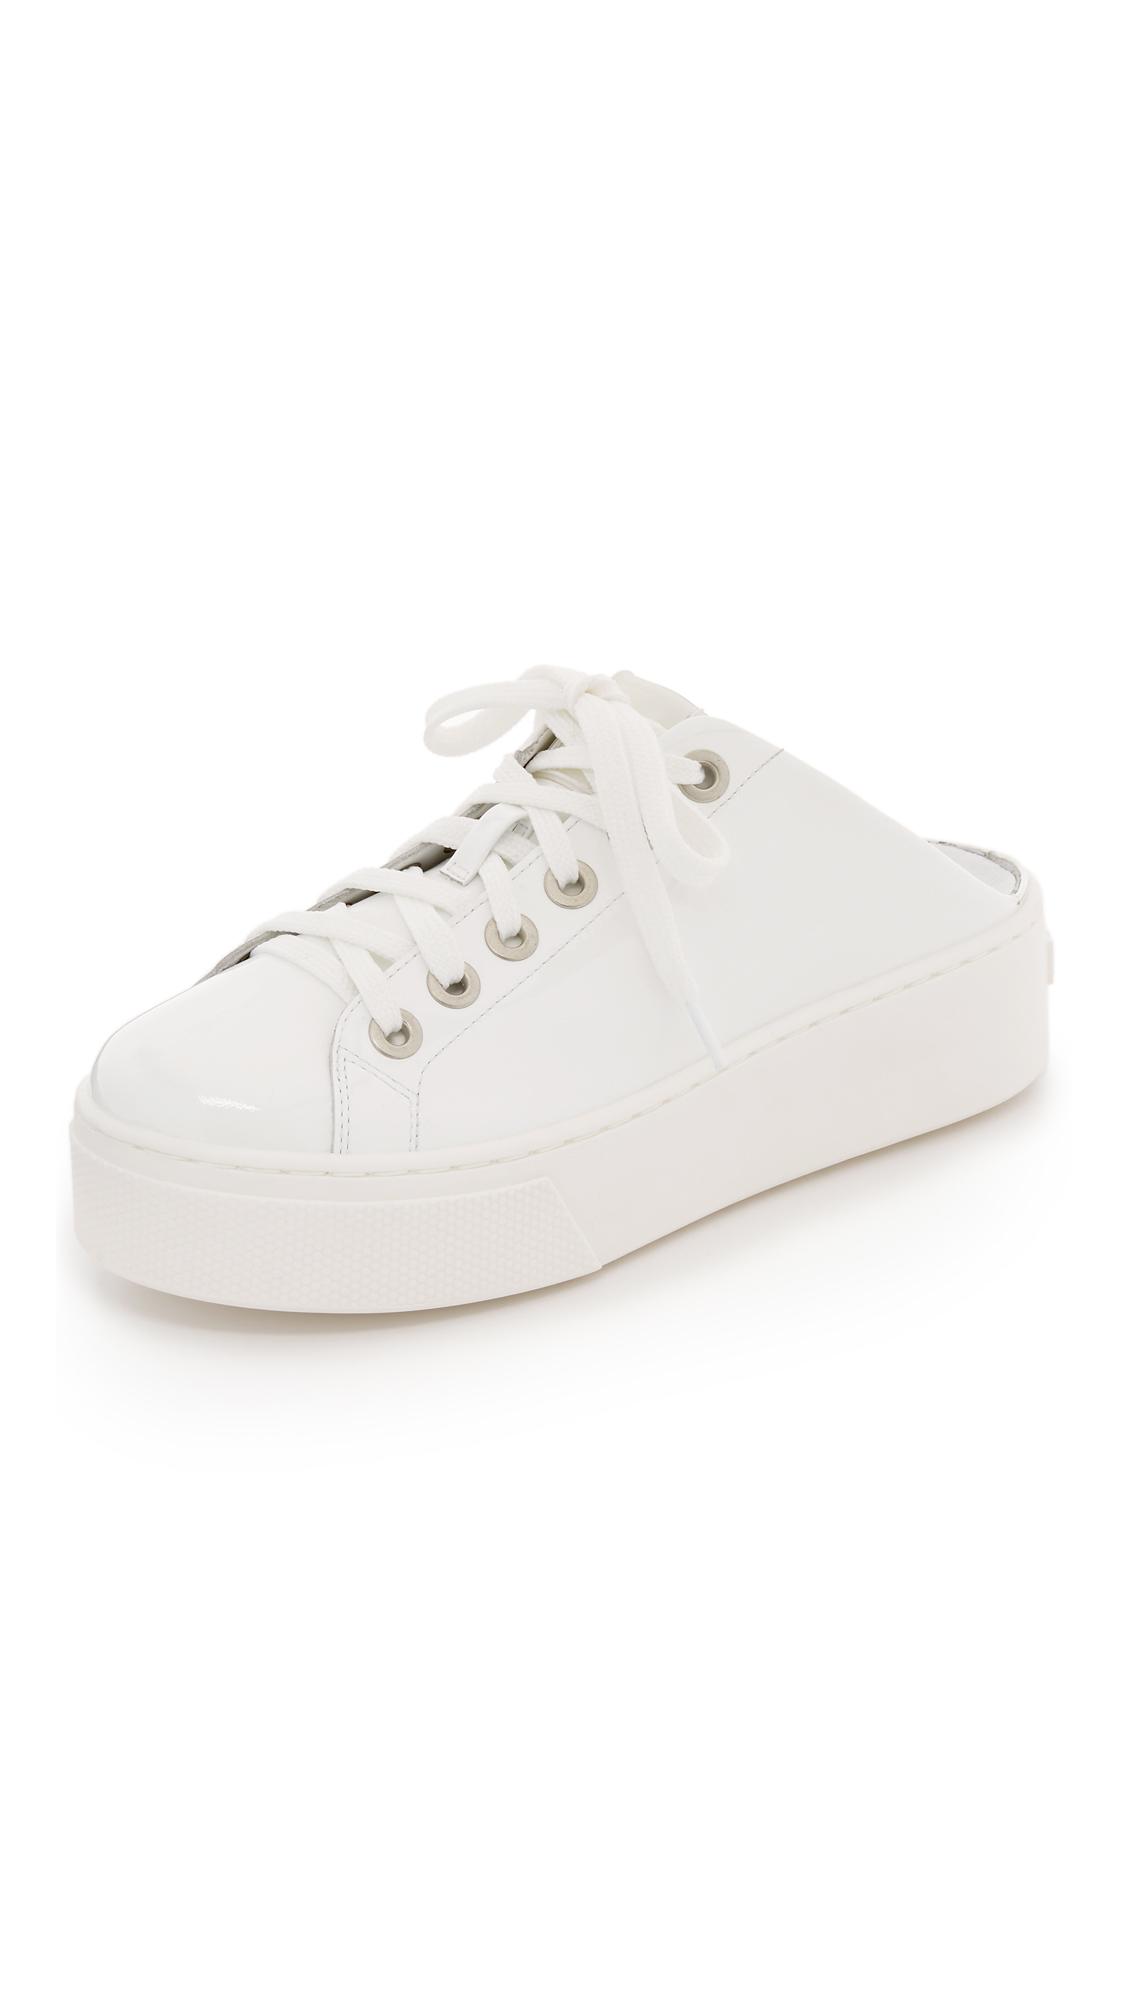 KENZO Leather Platform Sneaker Slides